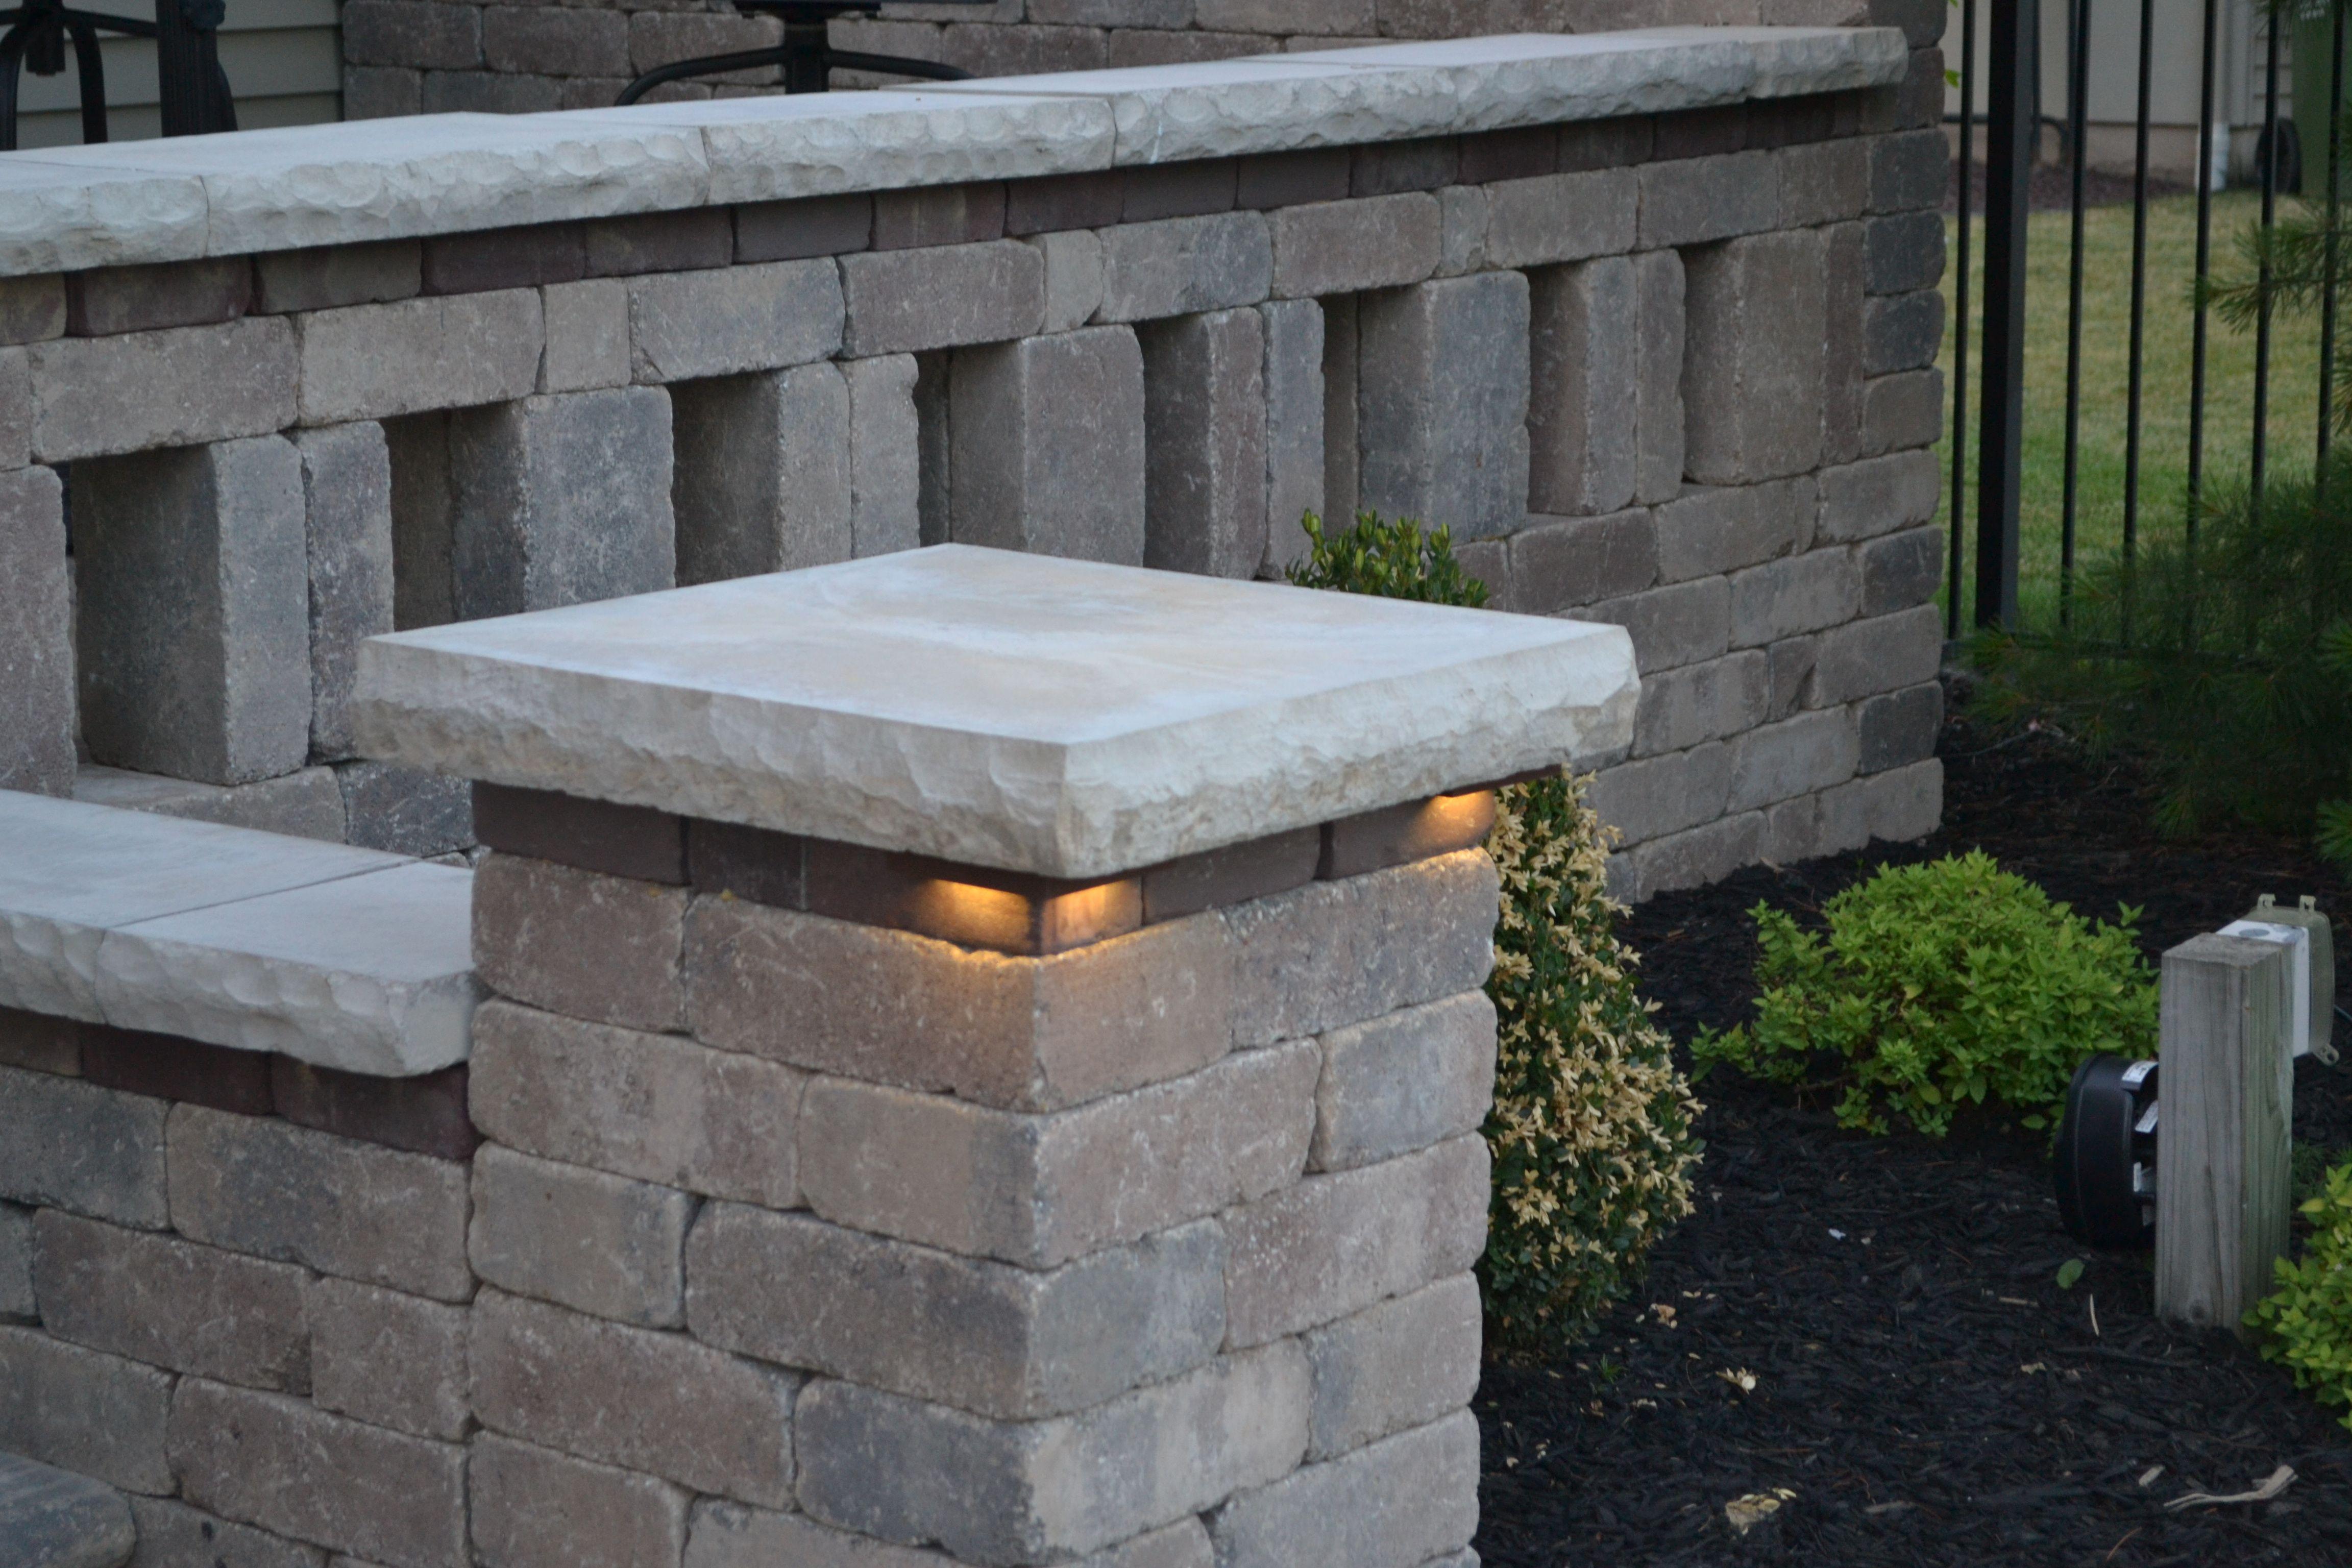 Kerr Lighting Led Lights For Steps Wall And Pillar Caps Sek Surebond Hardscape Lighting Retaining Wall Lighting Led Outdoor Lighting